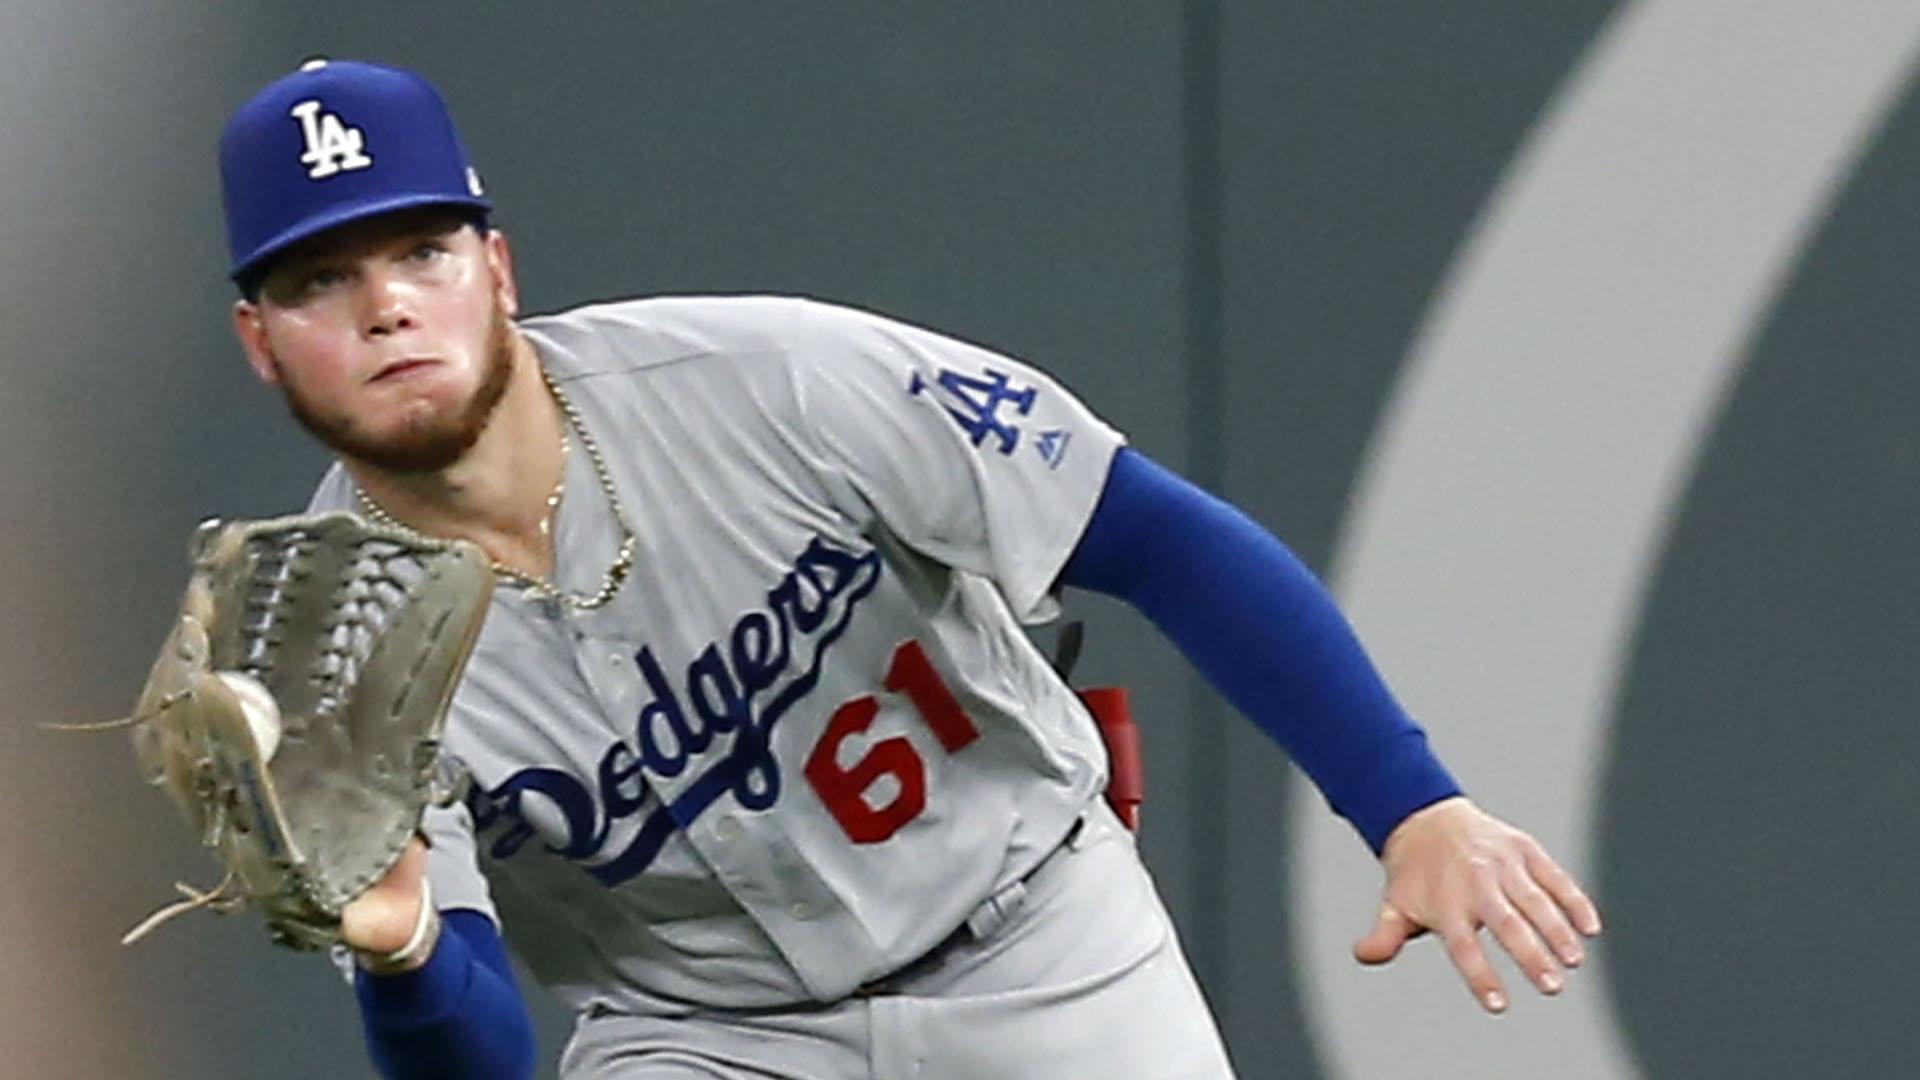 MLB wrap: Who is Alex Verdugo?